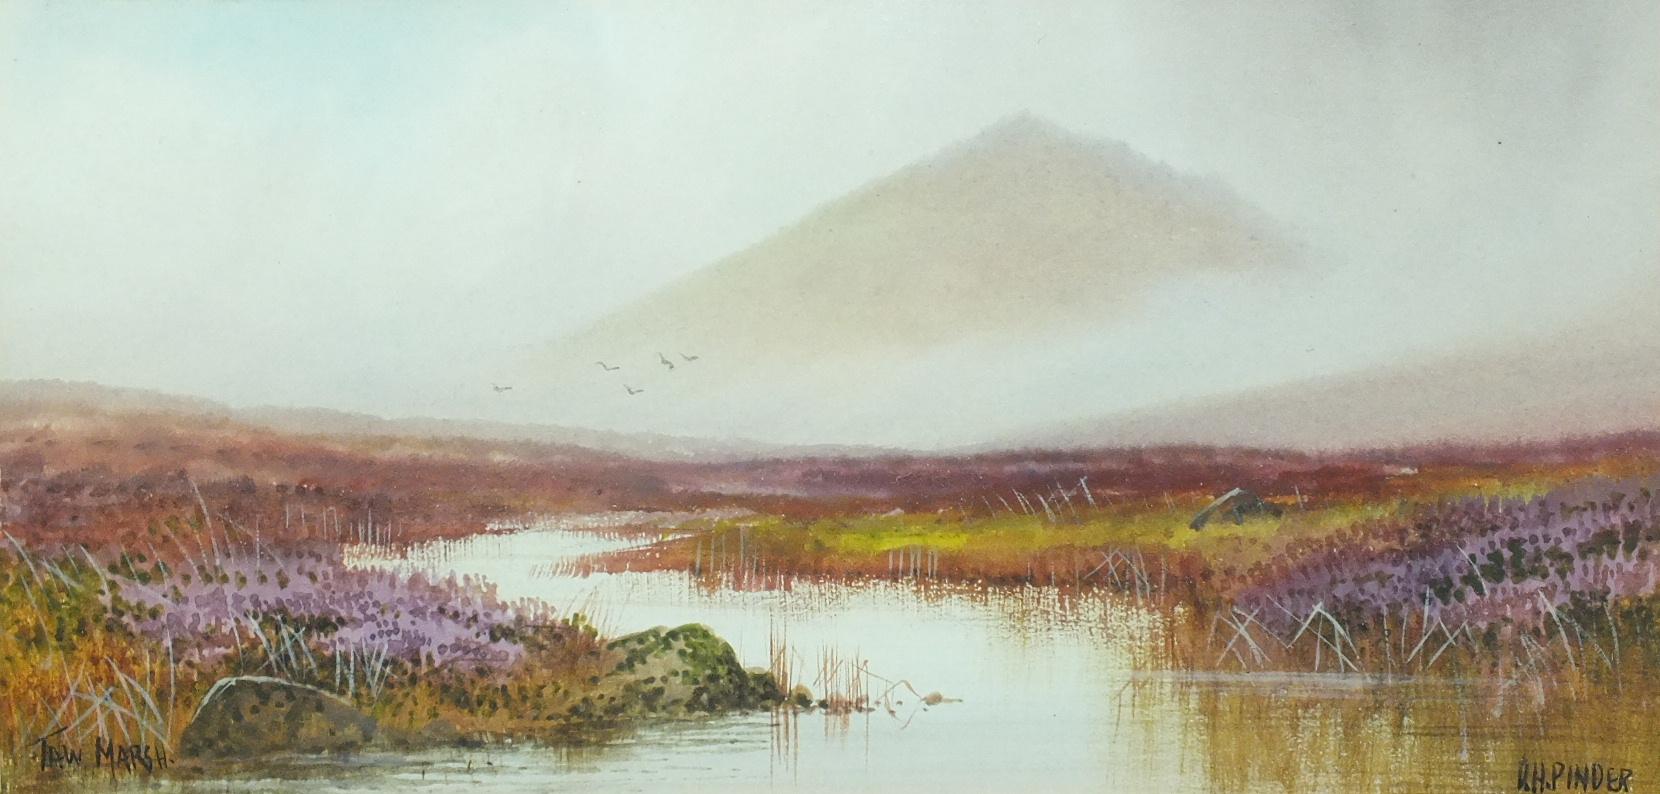 Lot 69 - •Douglas Houzen Pinder (1886-1949) TOR MARSH Signed and titled watercolour, 11.5 x 24cm, a companion